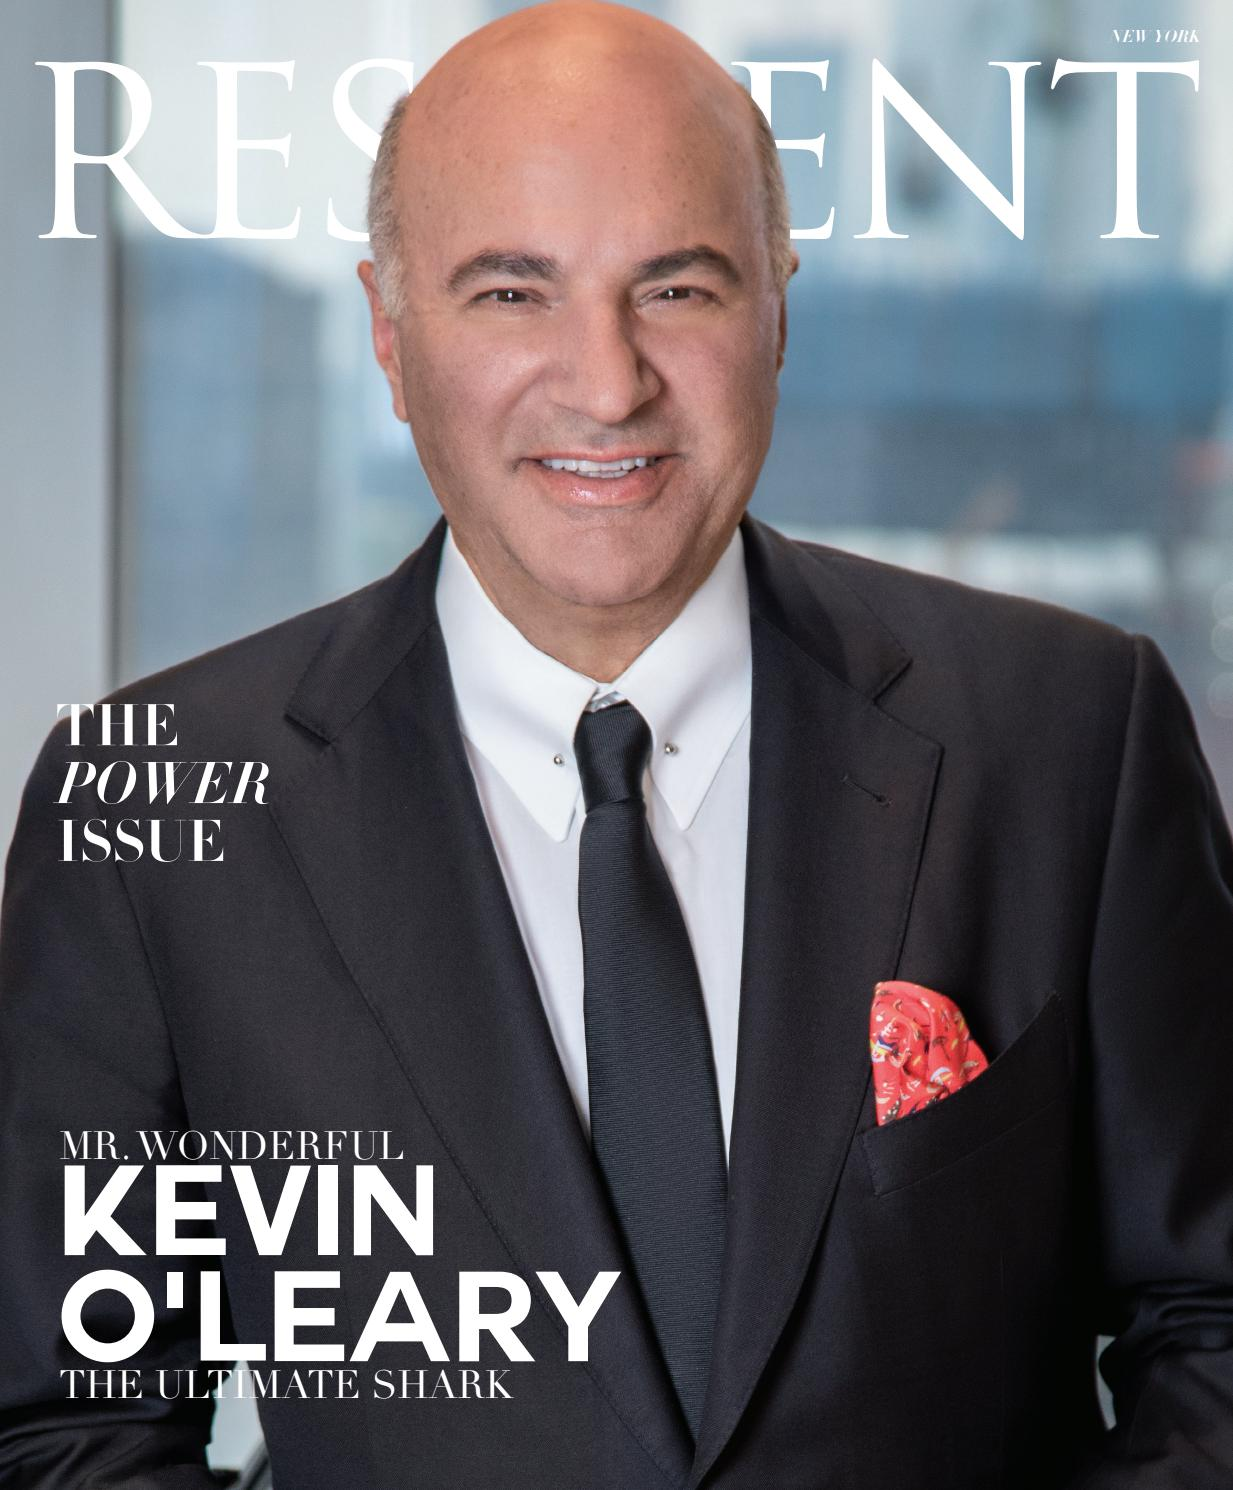 a397f6fa1b3 Resident Magazine NY NOVEMBER 2018 KEVIN O LEARY by Resident Magazine -  issuu